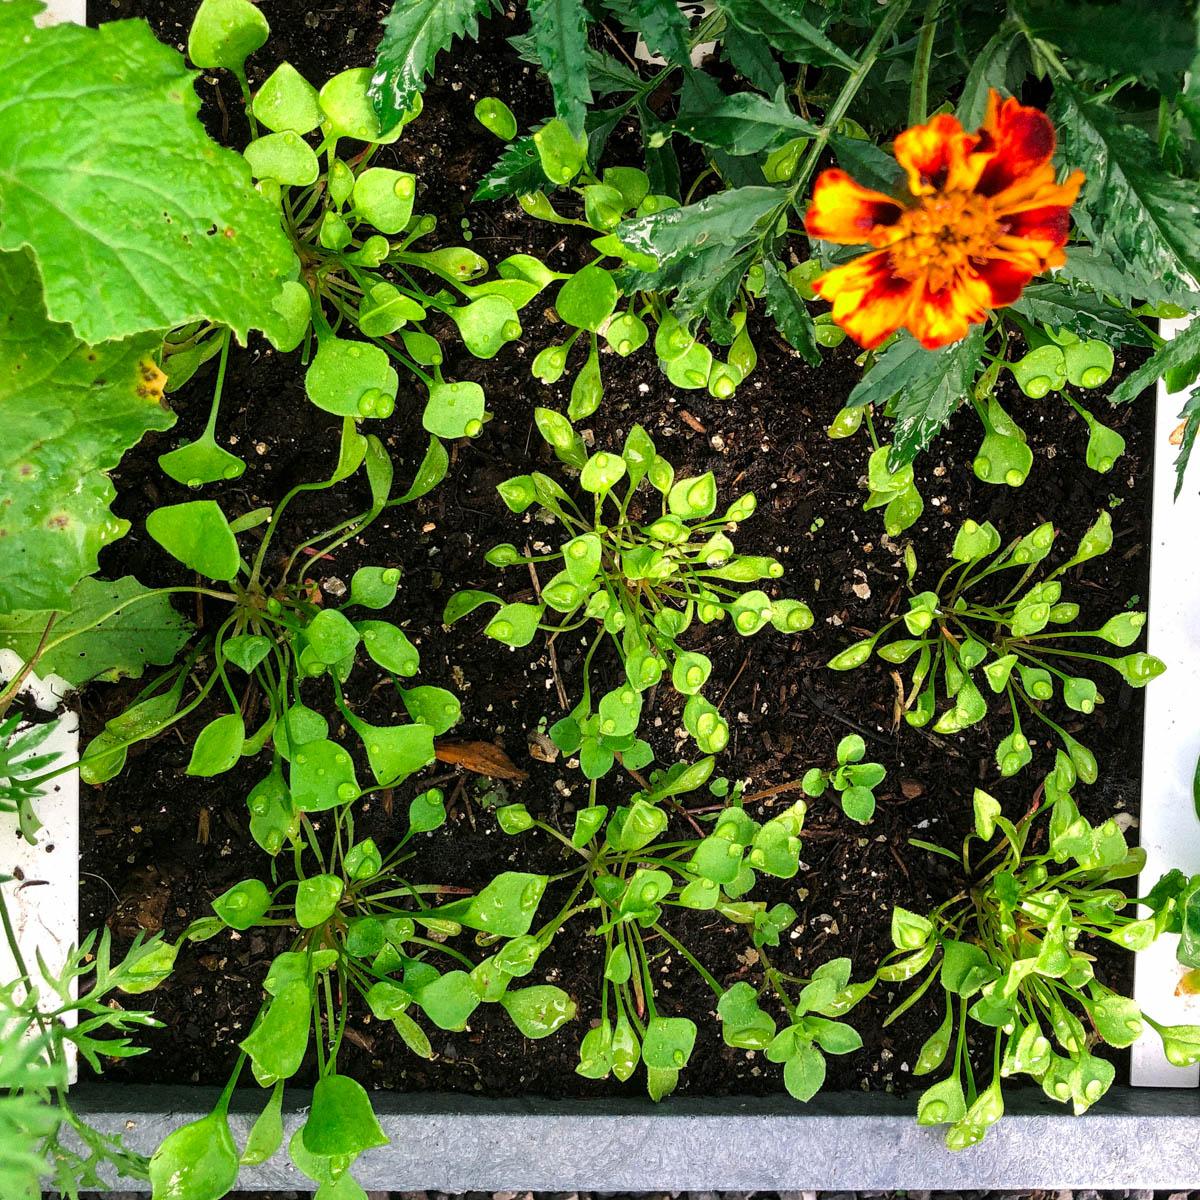 Kleine plantjes winterpostelein: uitdunnen hoeft niet